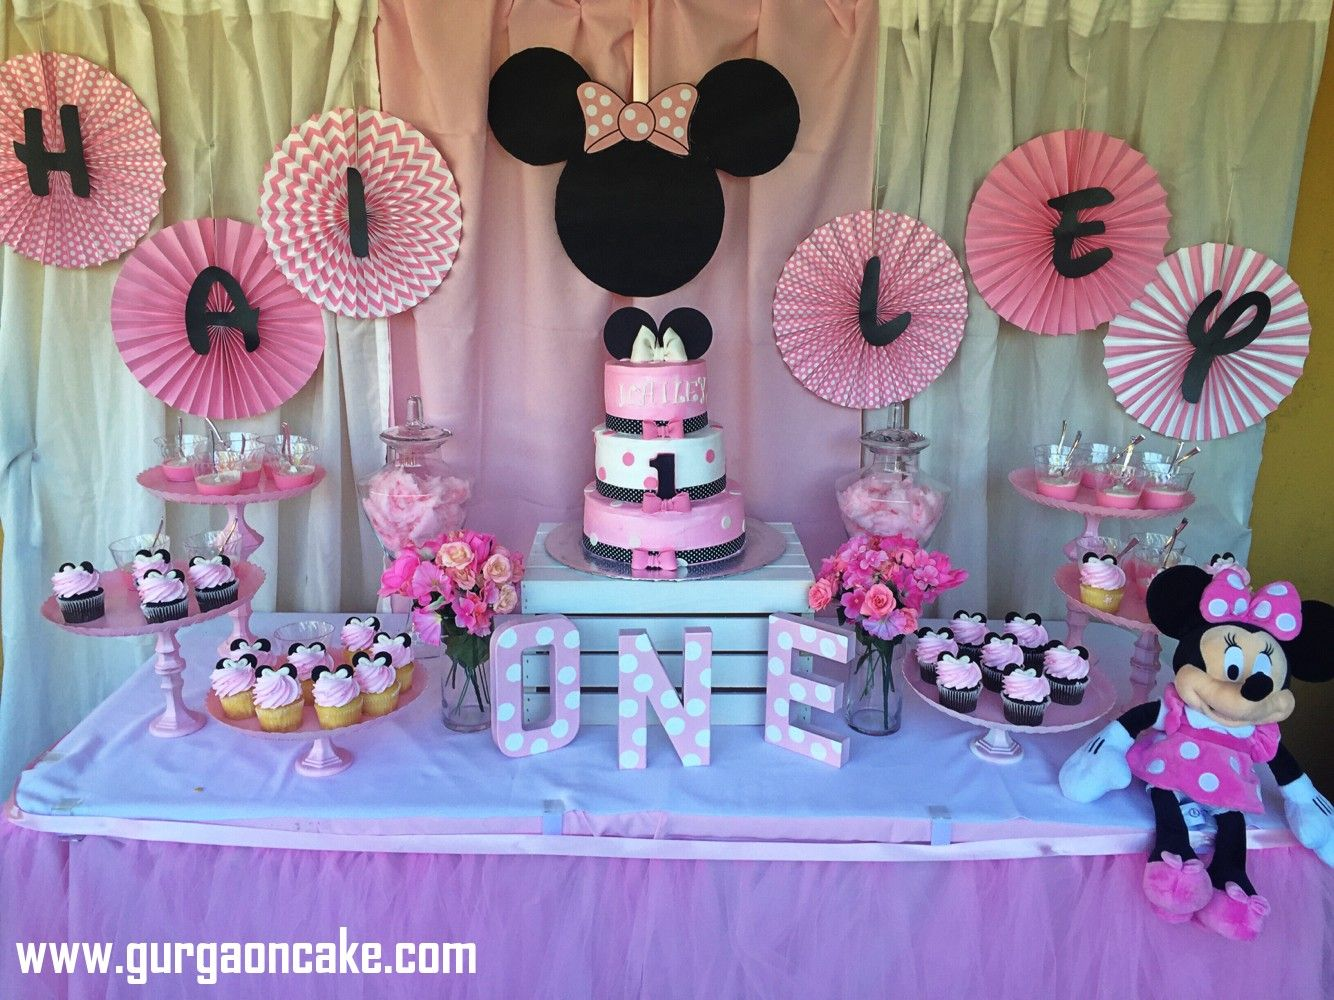 Cake Table Ideas For First Birthday Minnie Mouse First Birthday Minnie Birthday Party Minnie Mouse 1st Birthday